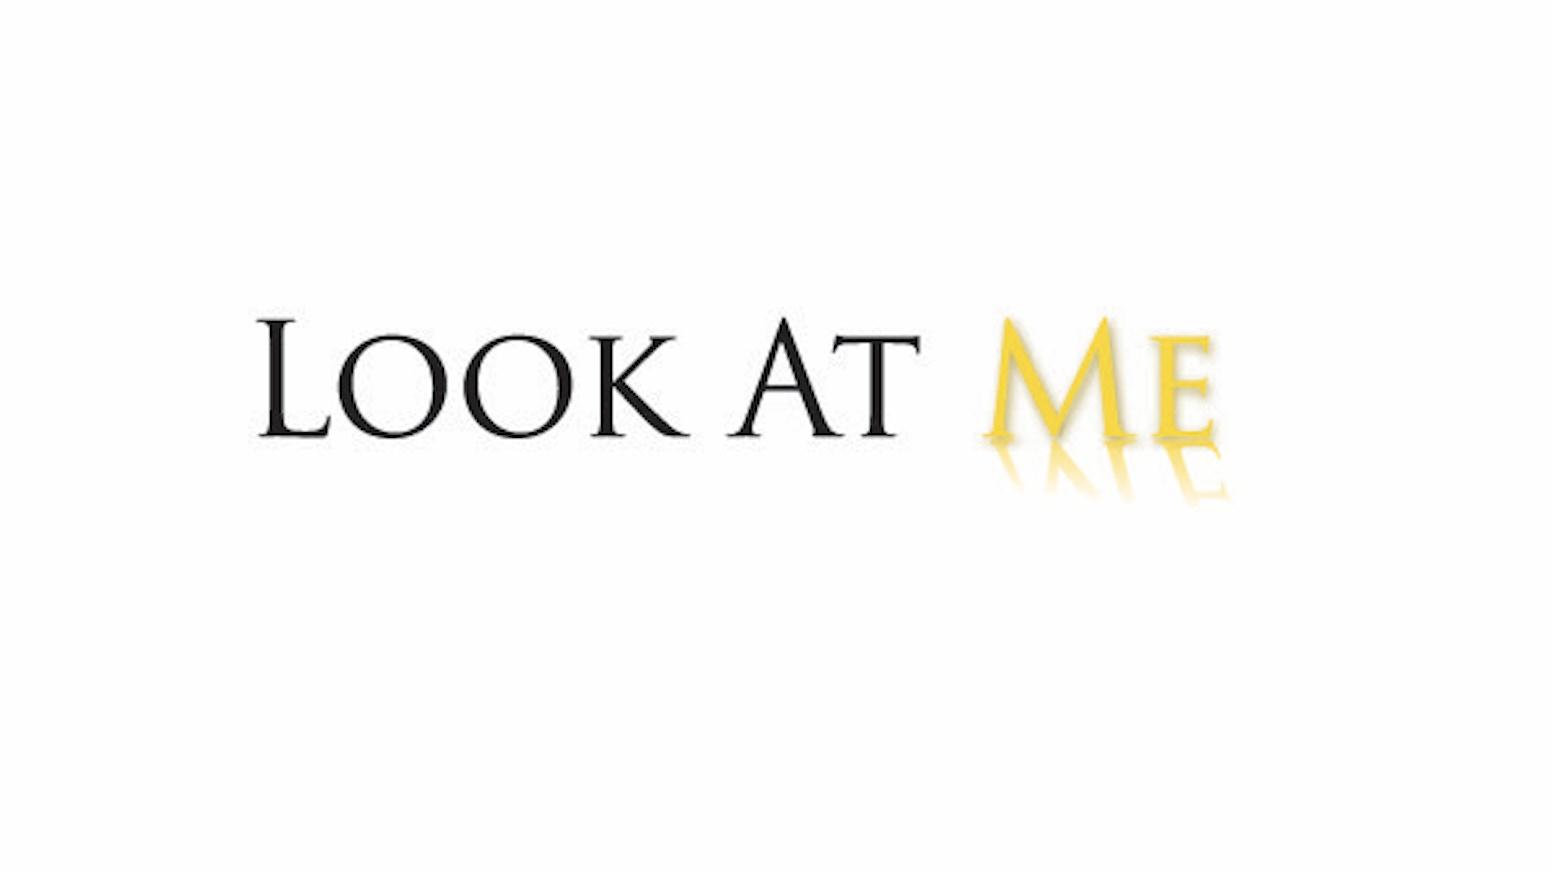 Look At Me - A Comedy Web Series by Gemma Keliher — Kickstarter